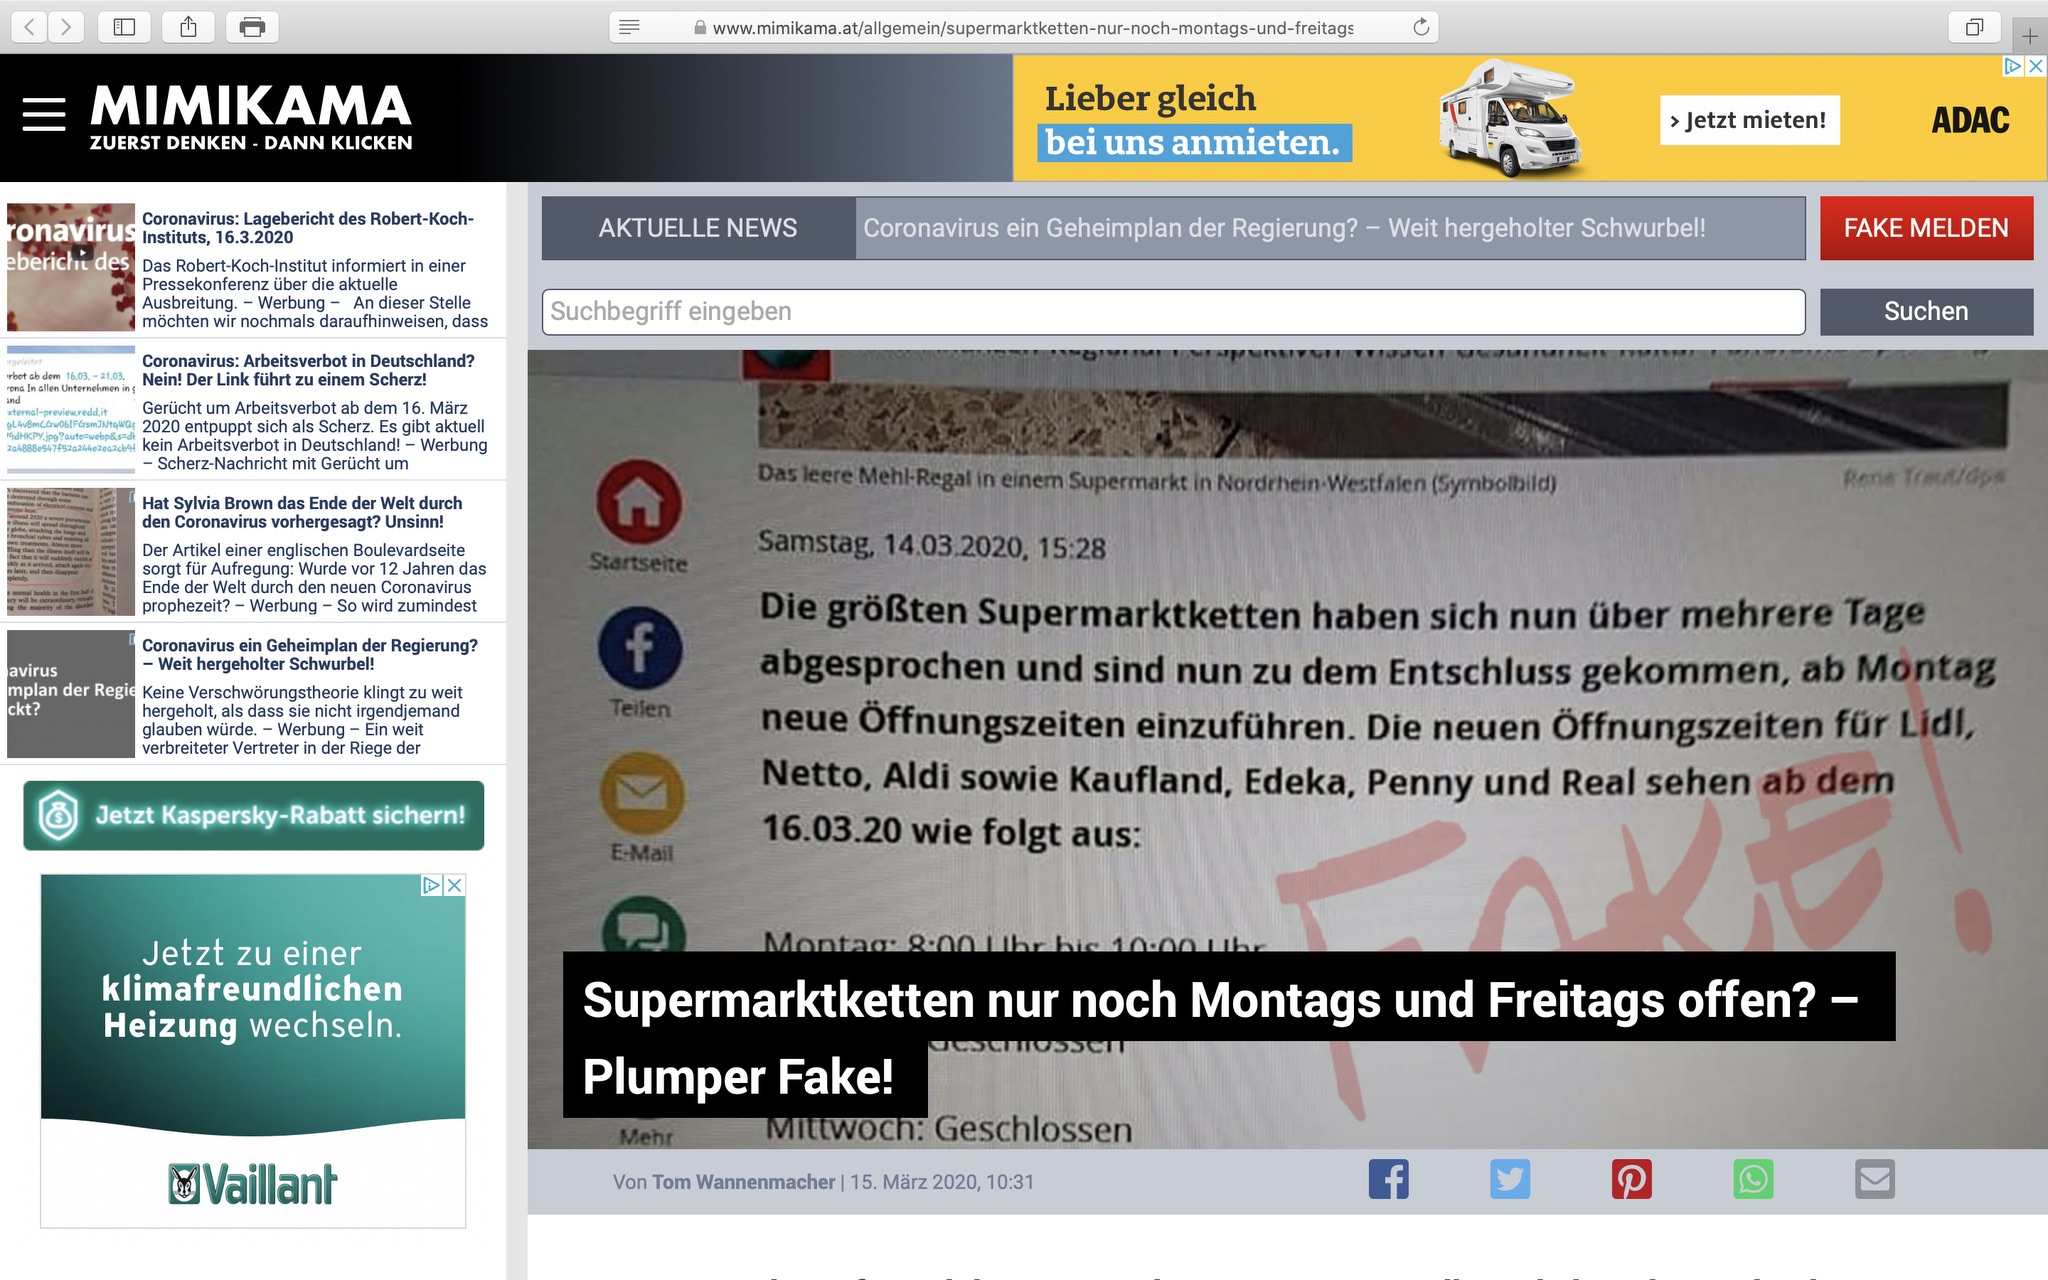 Mimikama.at klärt auf: Supermärkte bleiben geöffnet; Screenshot